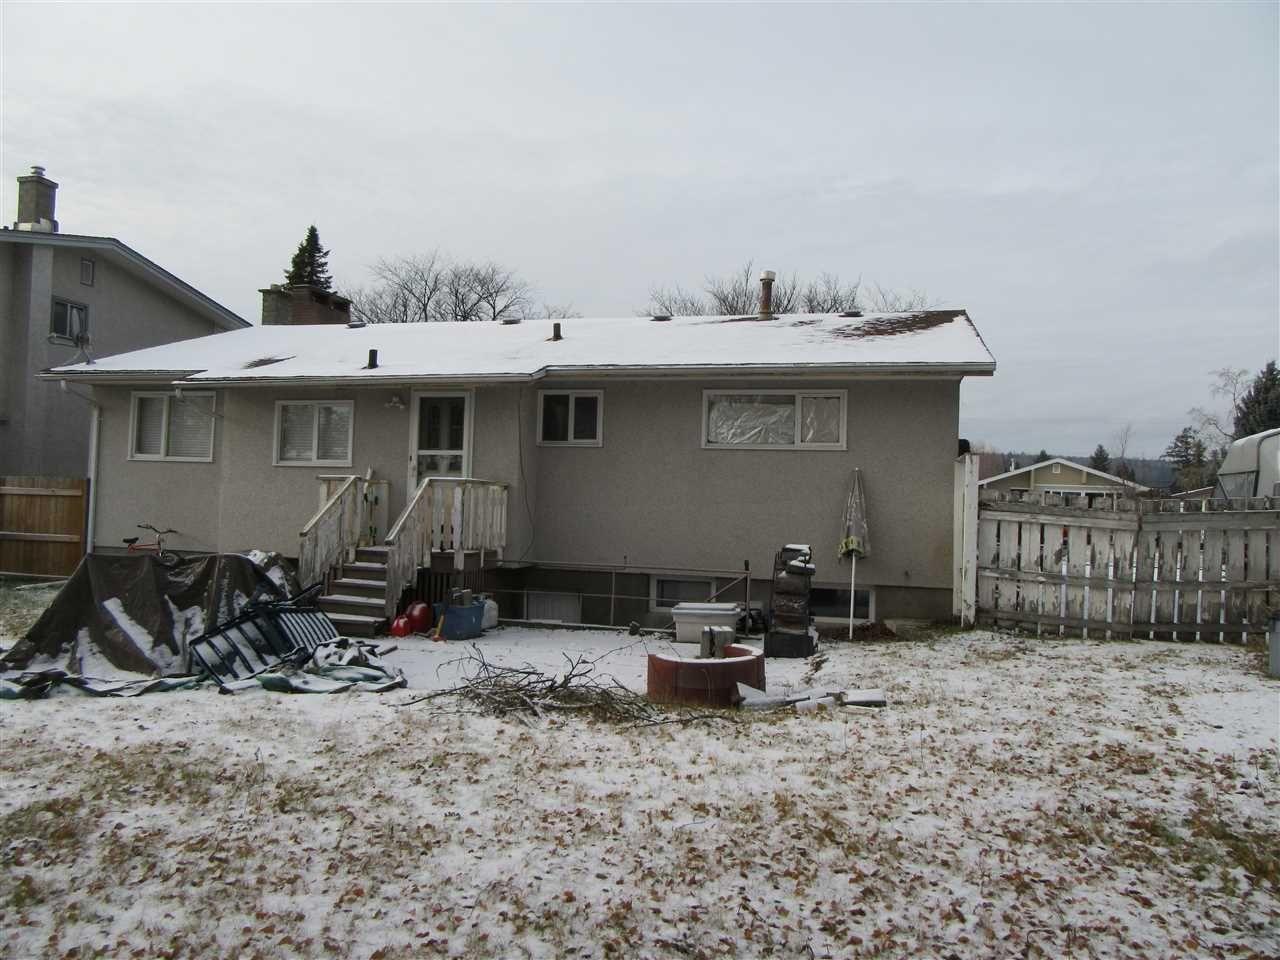 Photo 19: Photos: 522 RADCLIFFE Drive: Quinson House for sale (PG City West (Zone 71))  : MLS®# R2433646